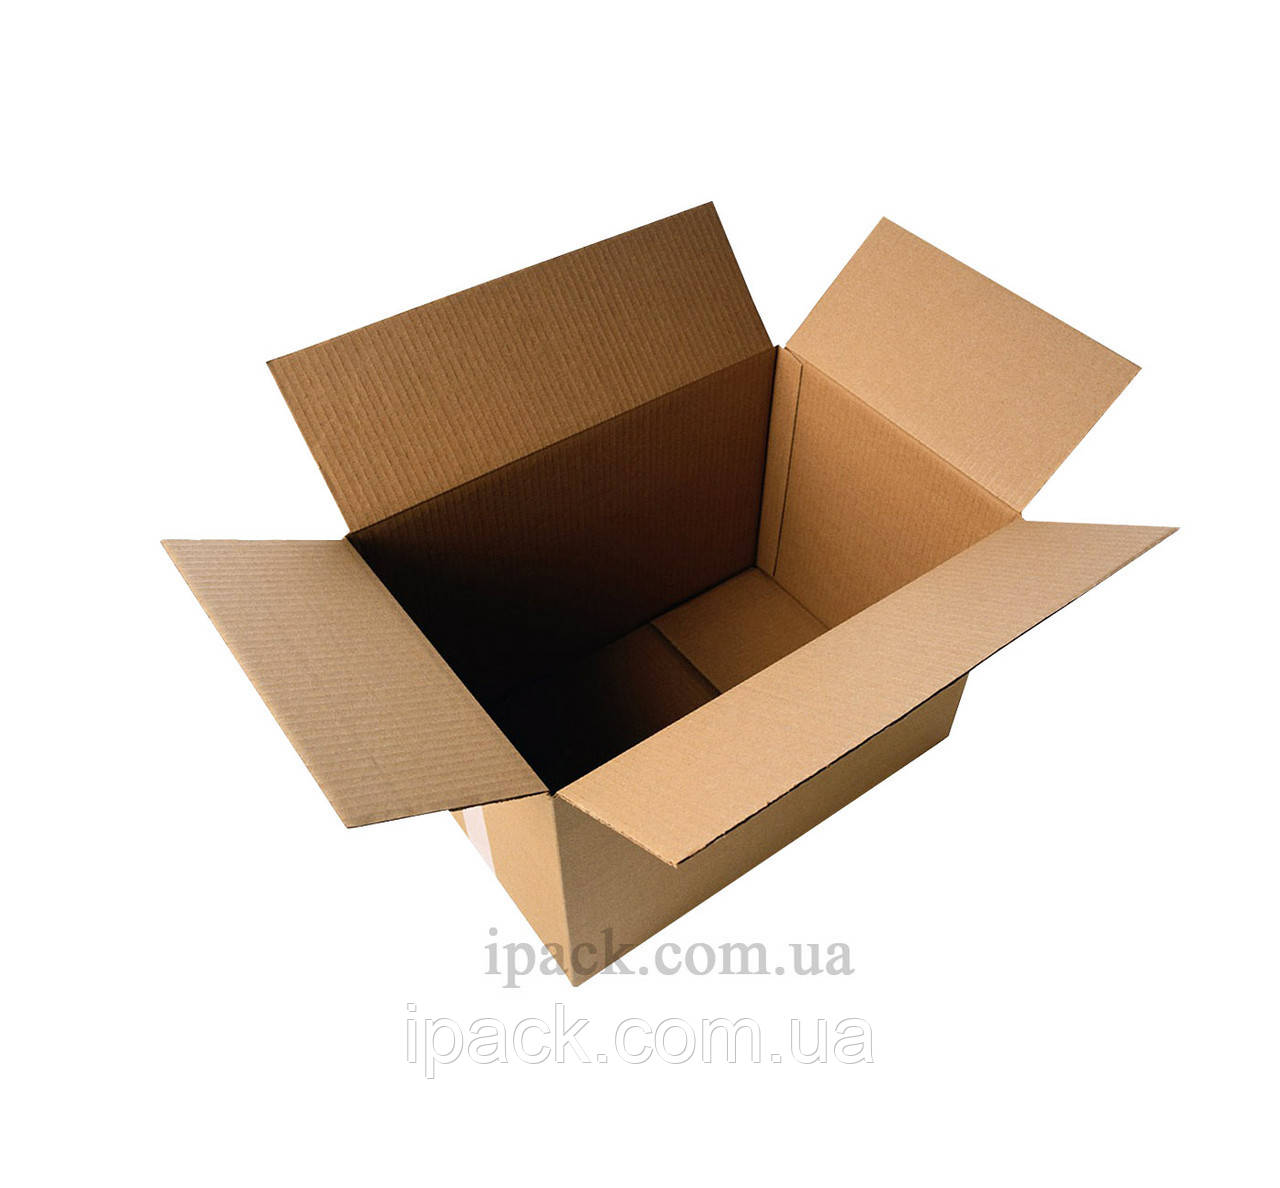 Гофроящик 100*100*200 мм, бурый, четырехклапанный картонный короб